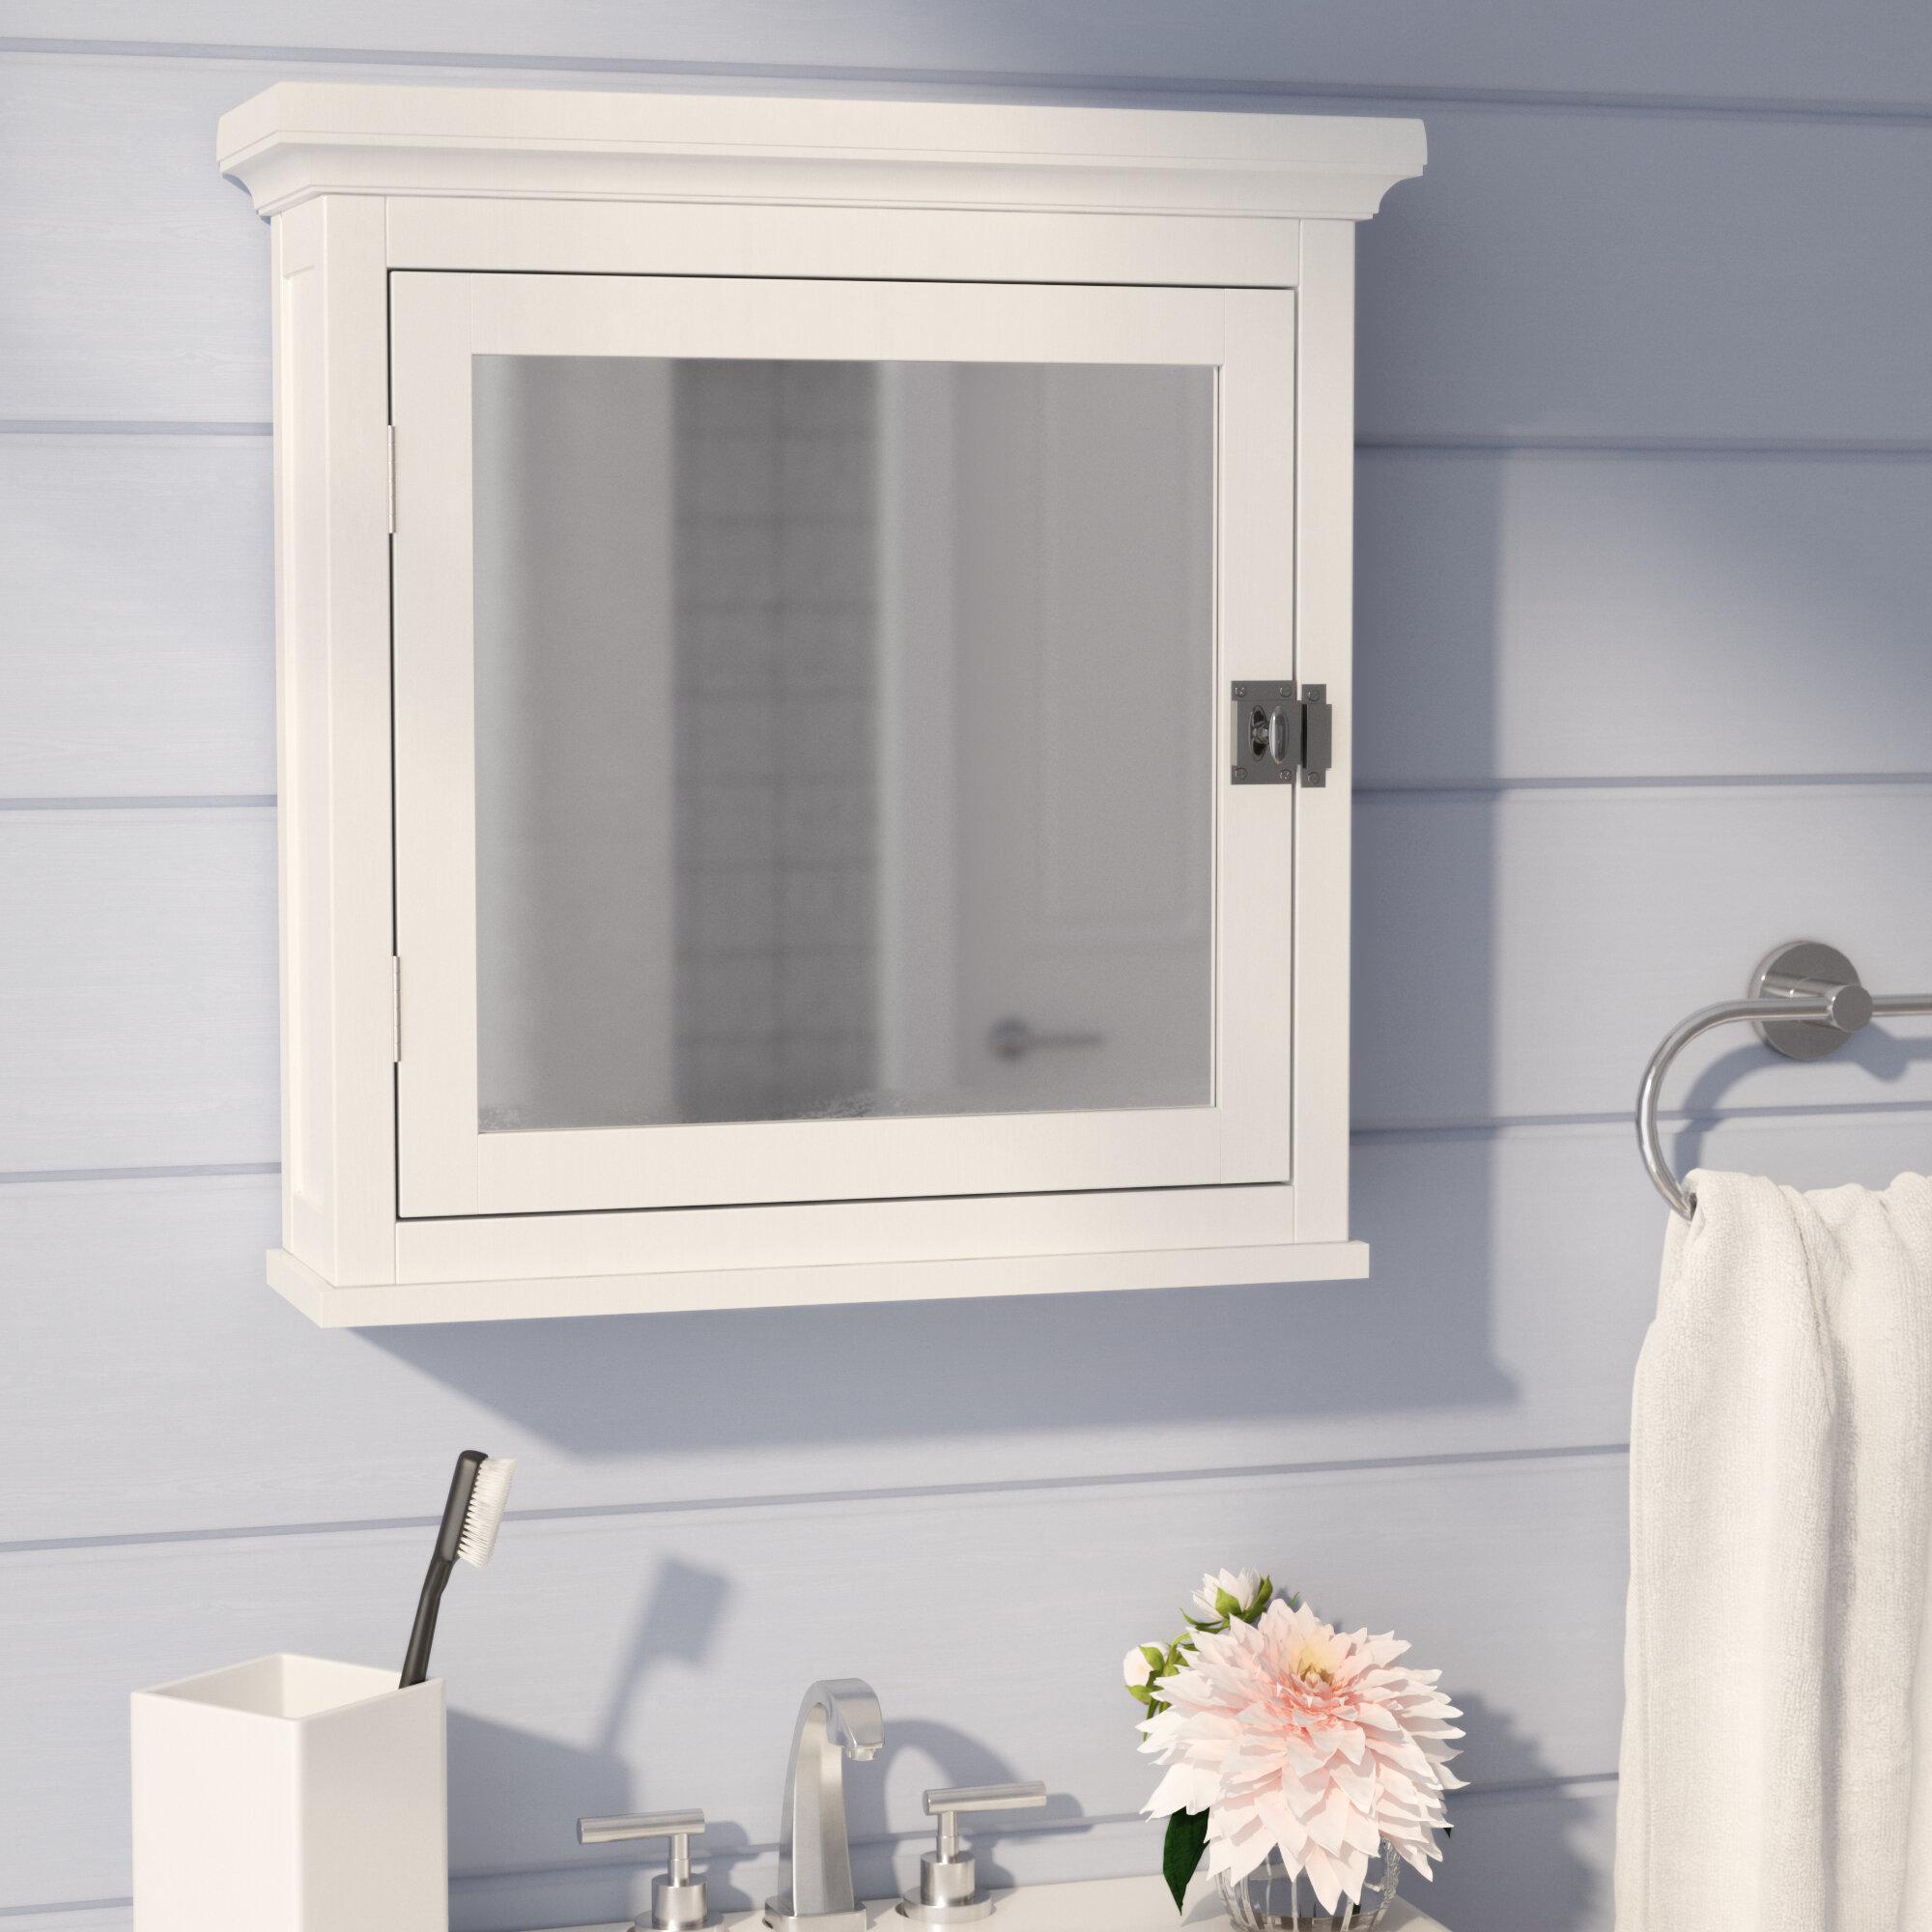 Beachcrest Home Sumter 18 75 X 19 Surface Mount Framed Medicine Cabinet With Adjule Shelves Reviews Wayfair